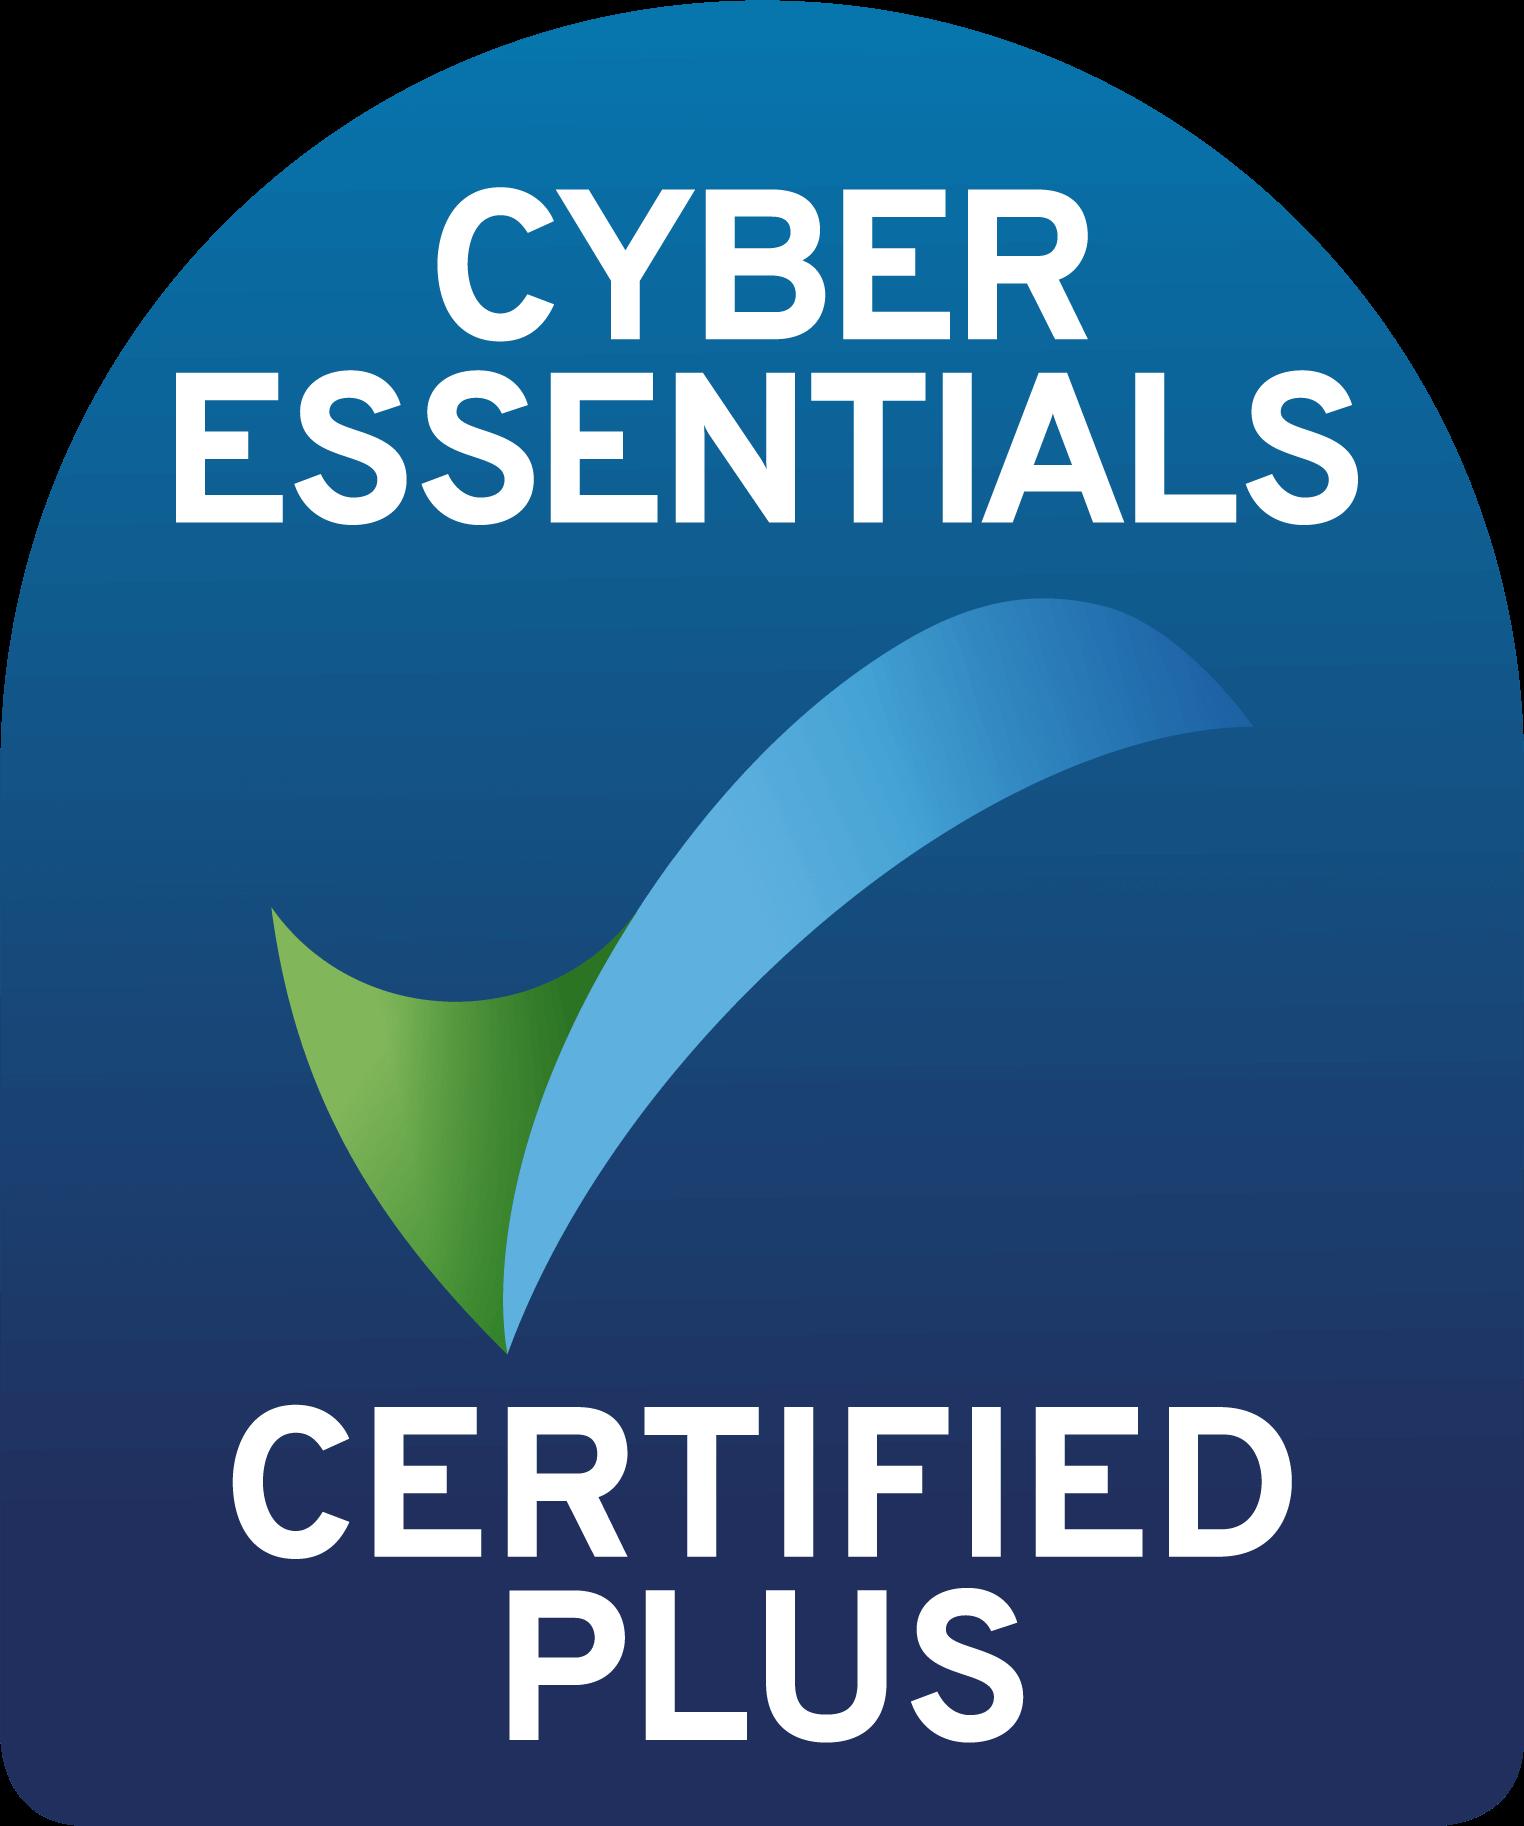 Cyber Essentials Plus